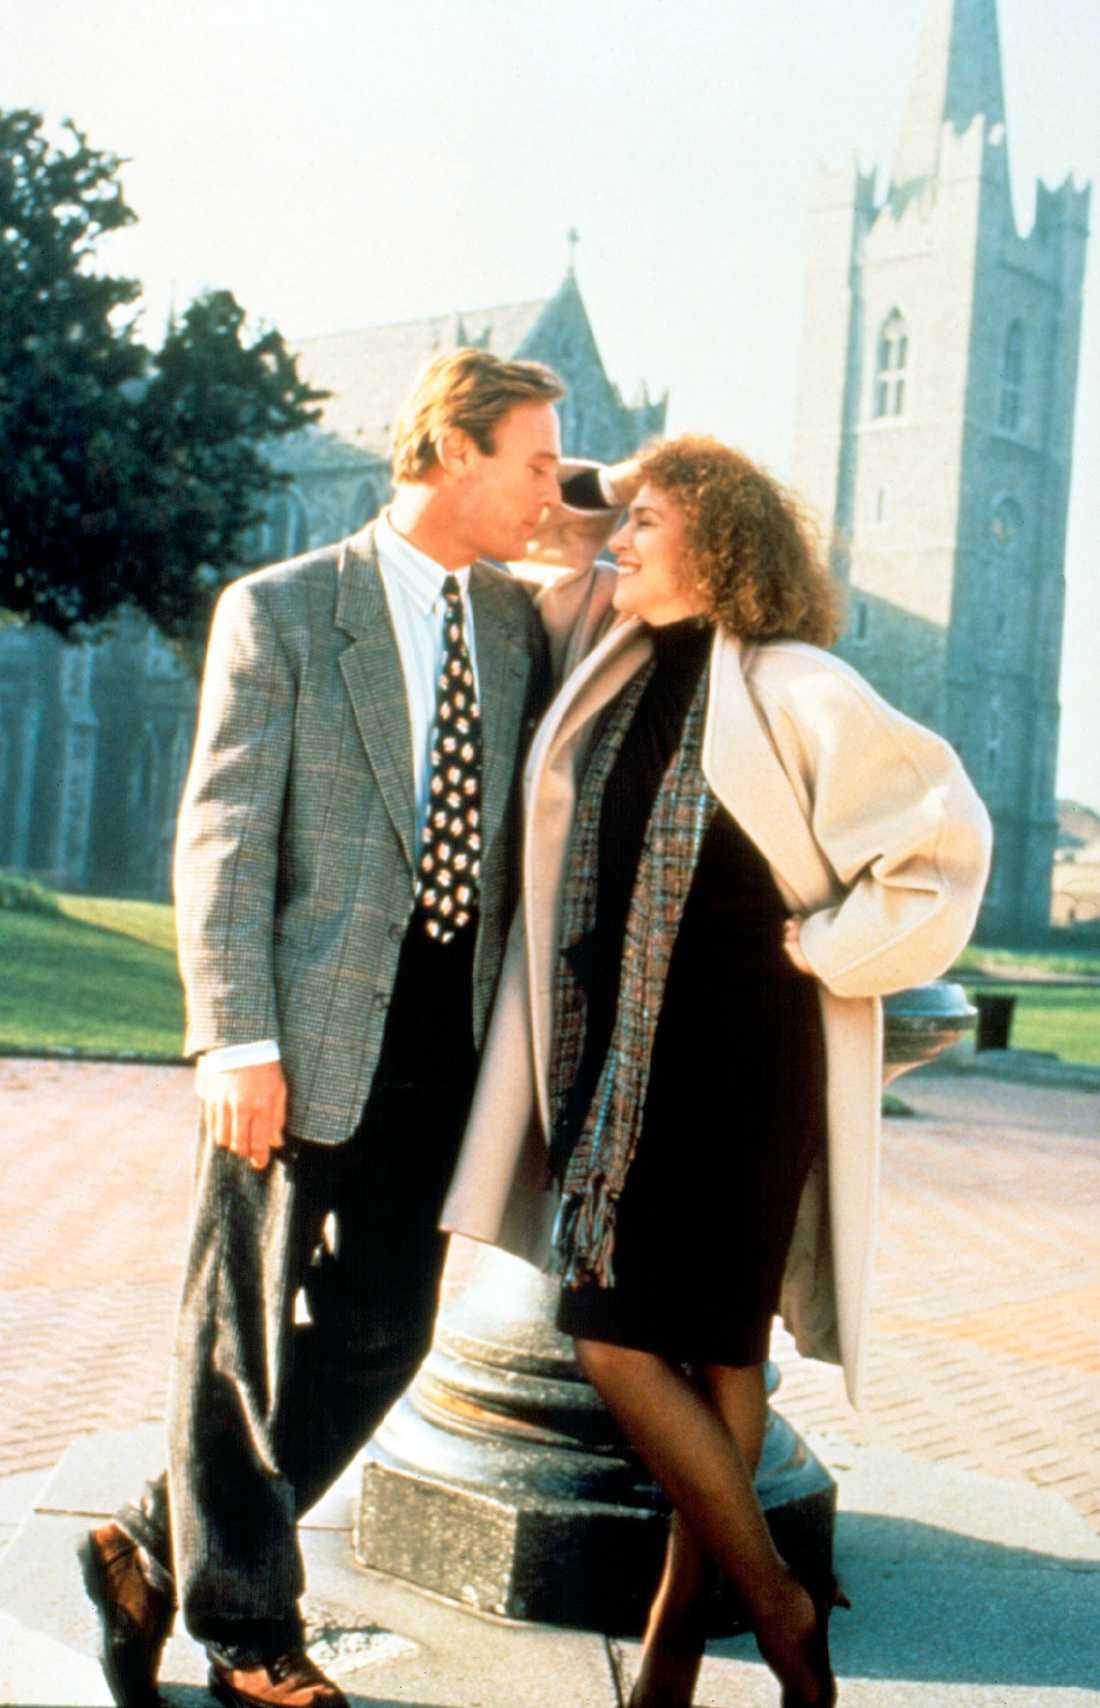 """A FINE ROMANCE"" MED CHRISTOPHER CAZENOVE OCH MARGARET WHITTON"